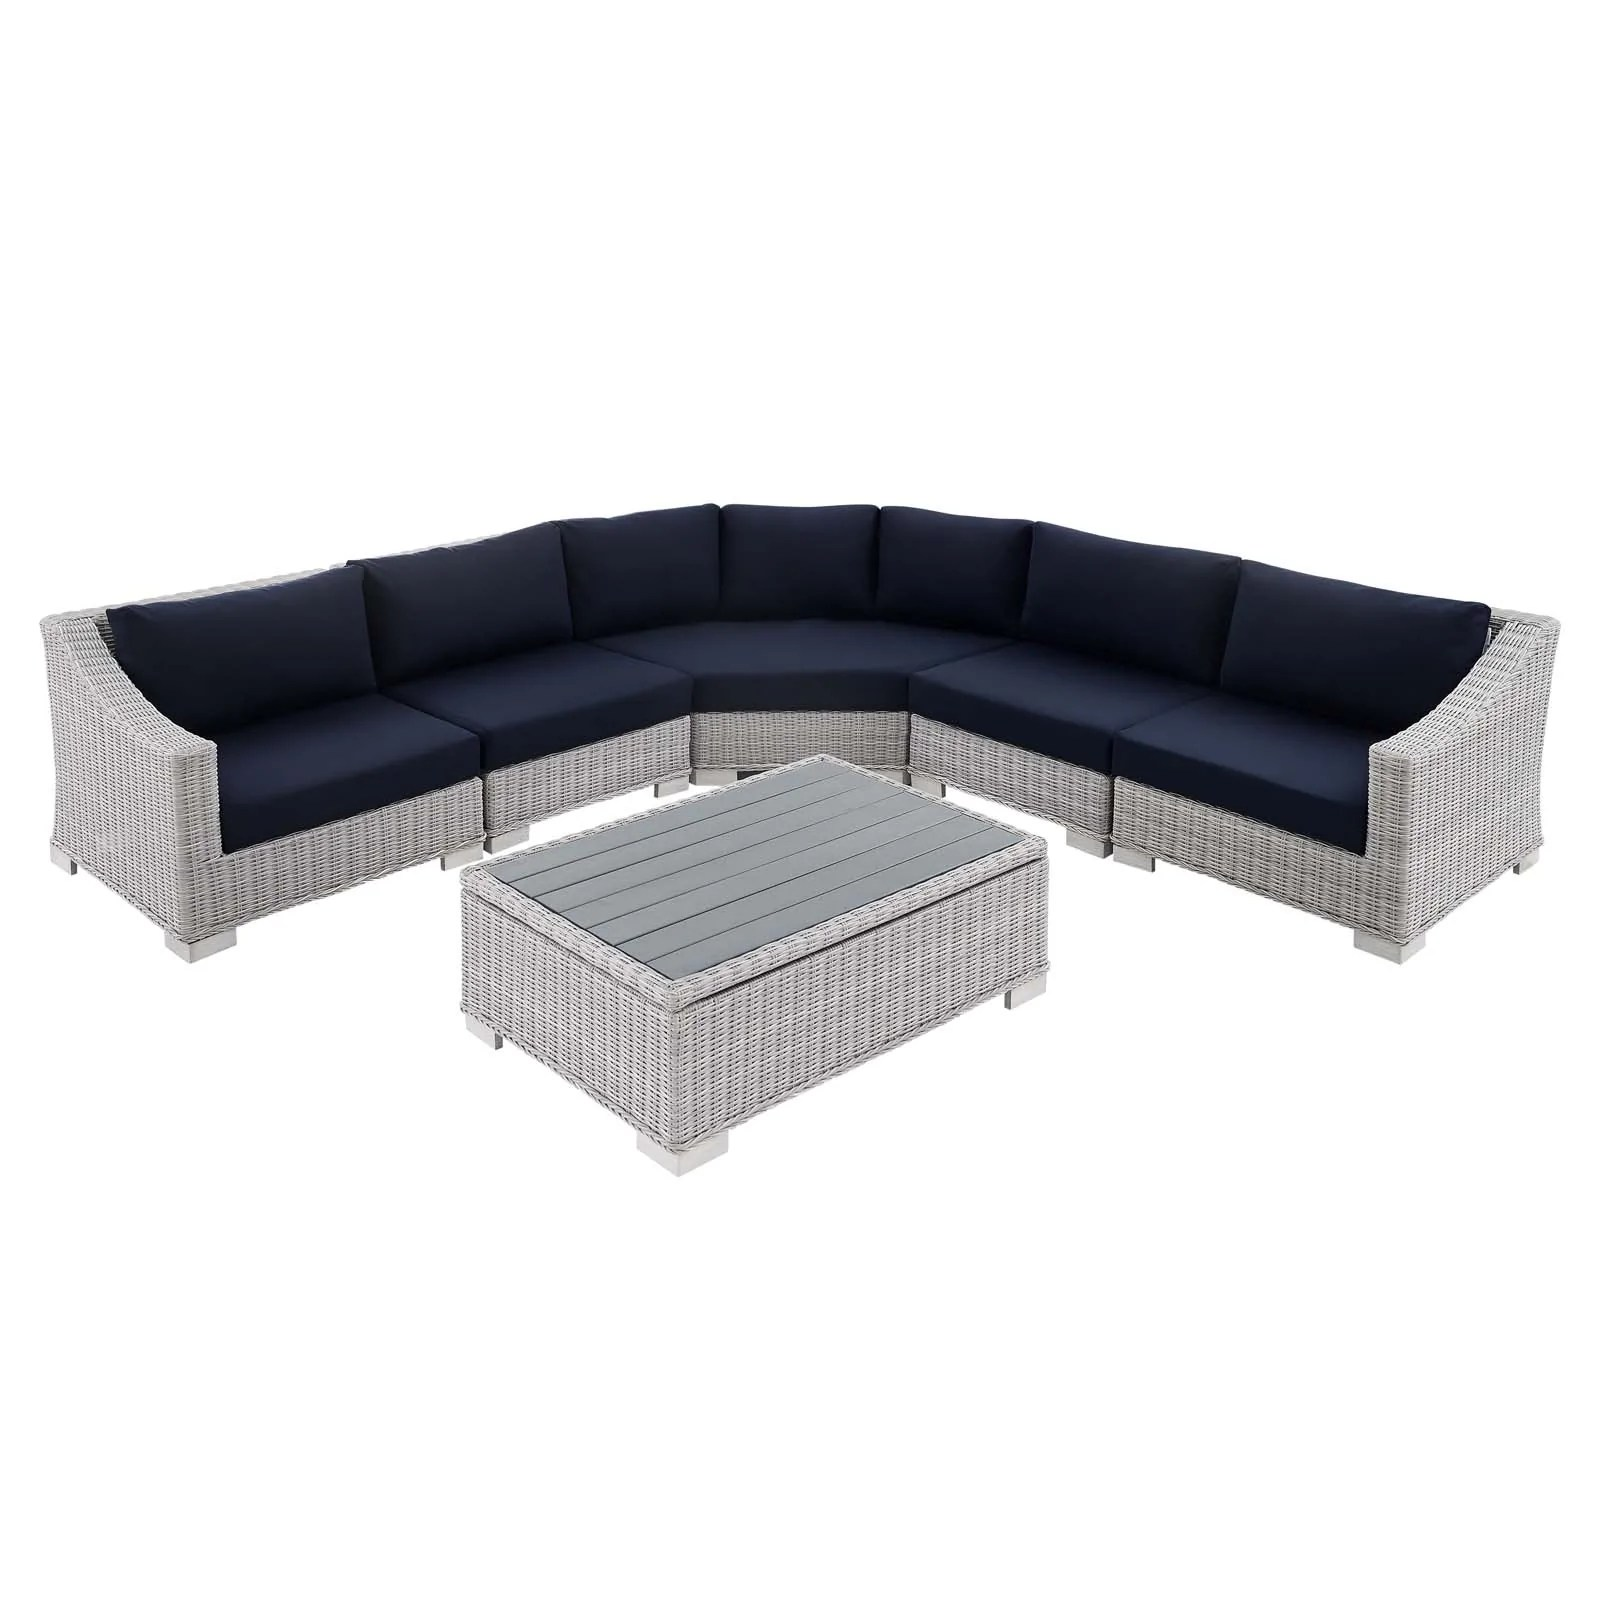 conway sunbrella outdoor patio wicker rattan 6 piece sectional sofa furniture set light gray navy